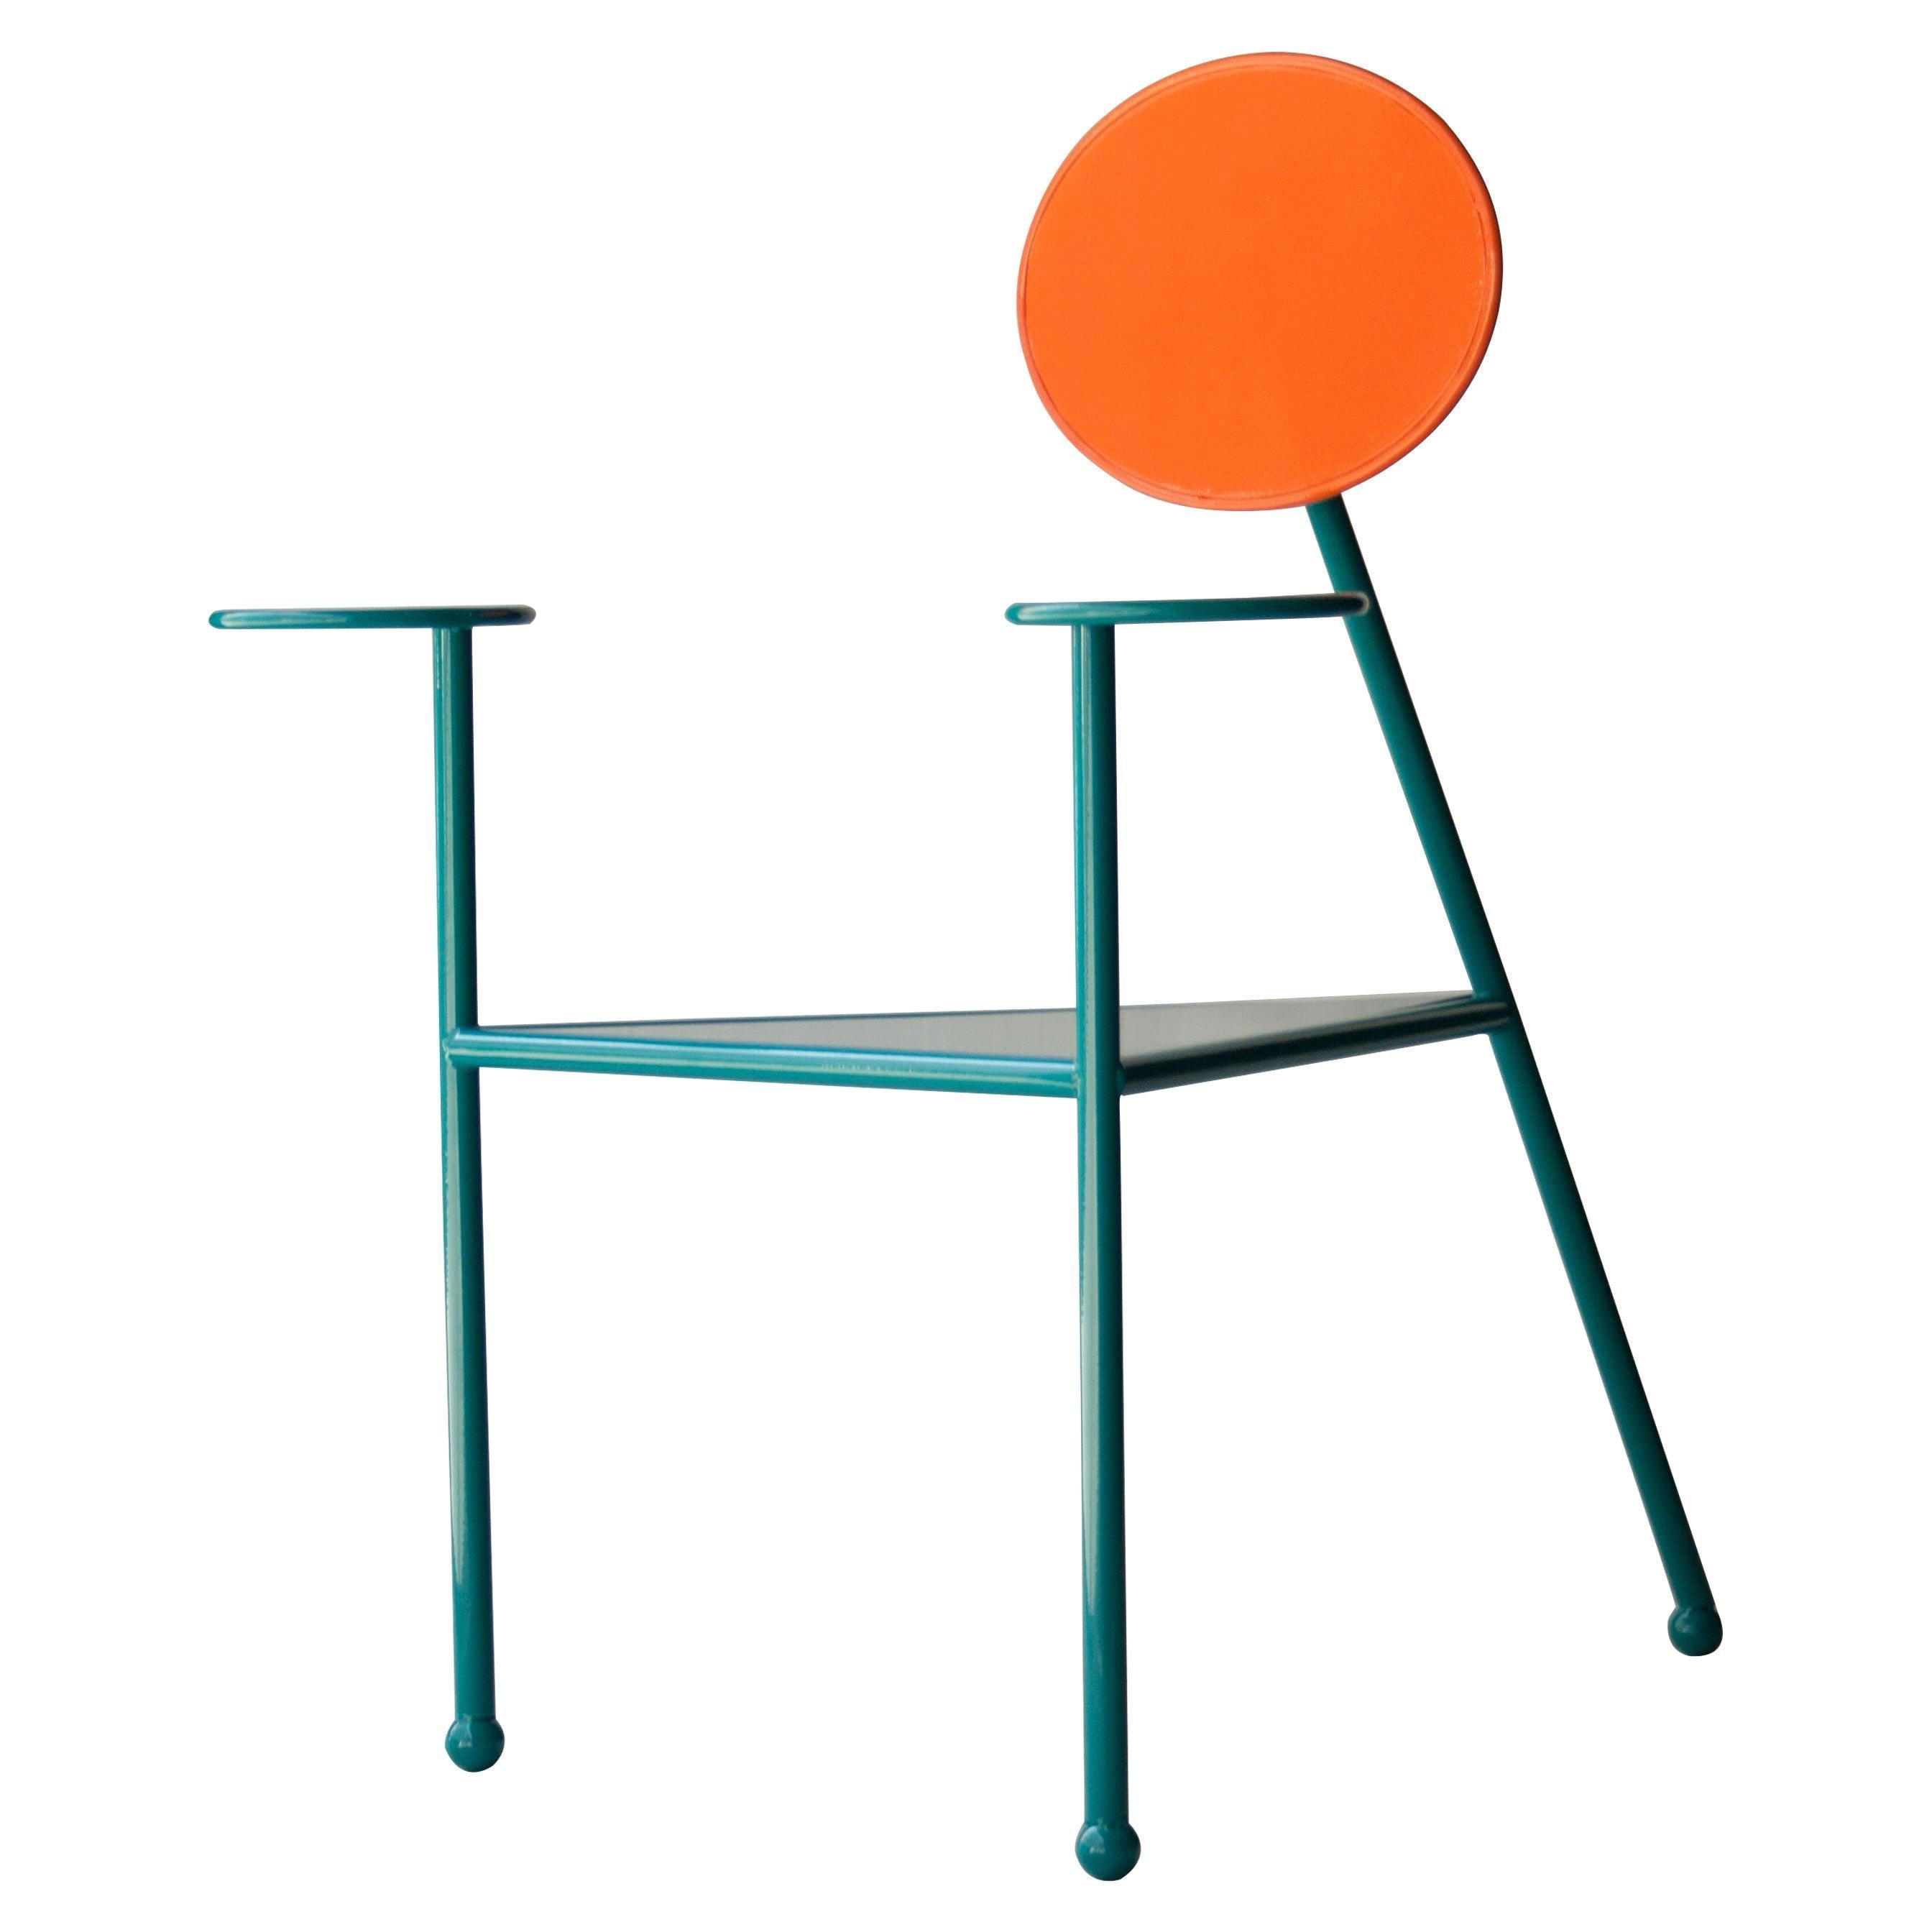 Kresta Studio Contemporary Steel Lacquered Orange Green Chair, Spain, 2019